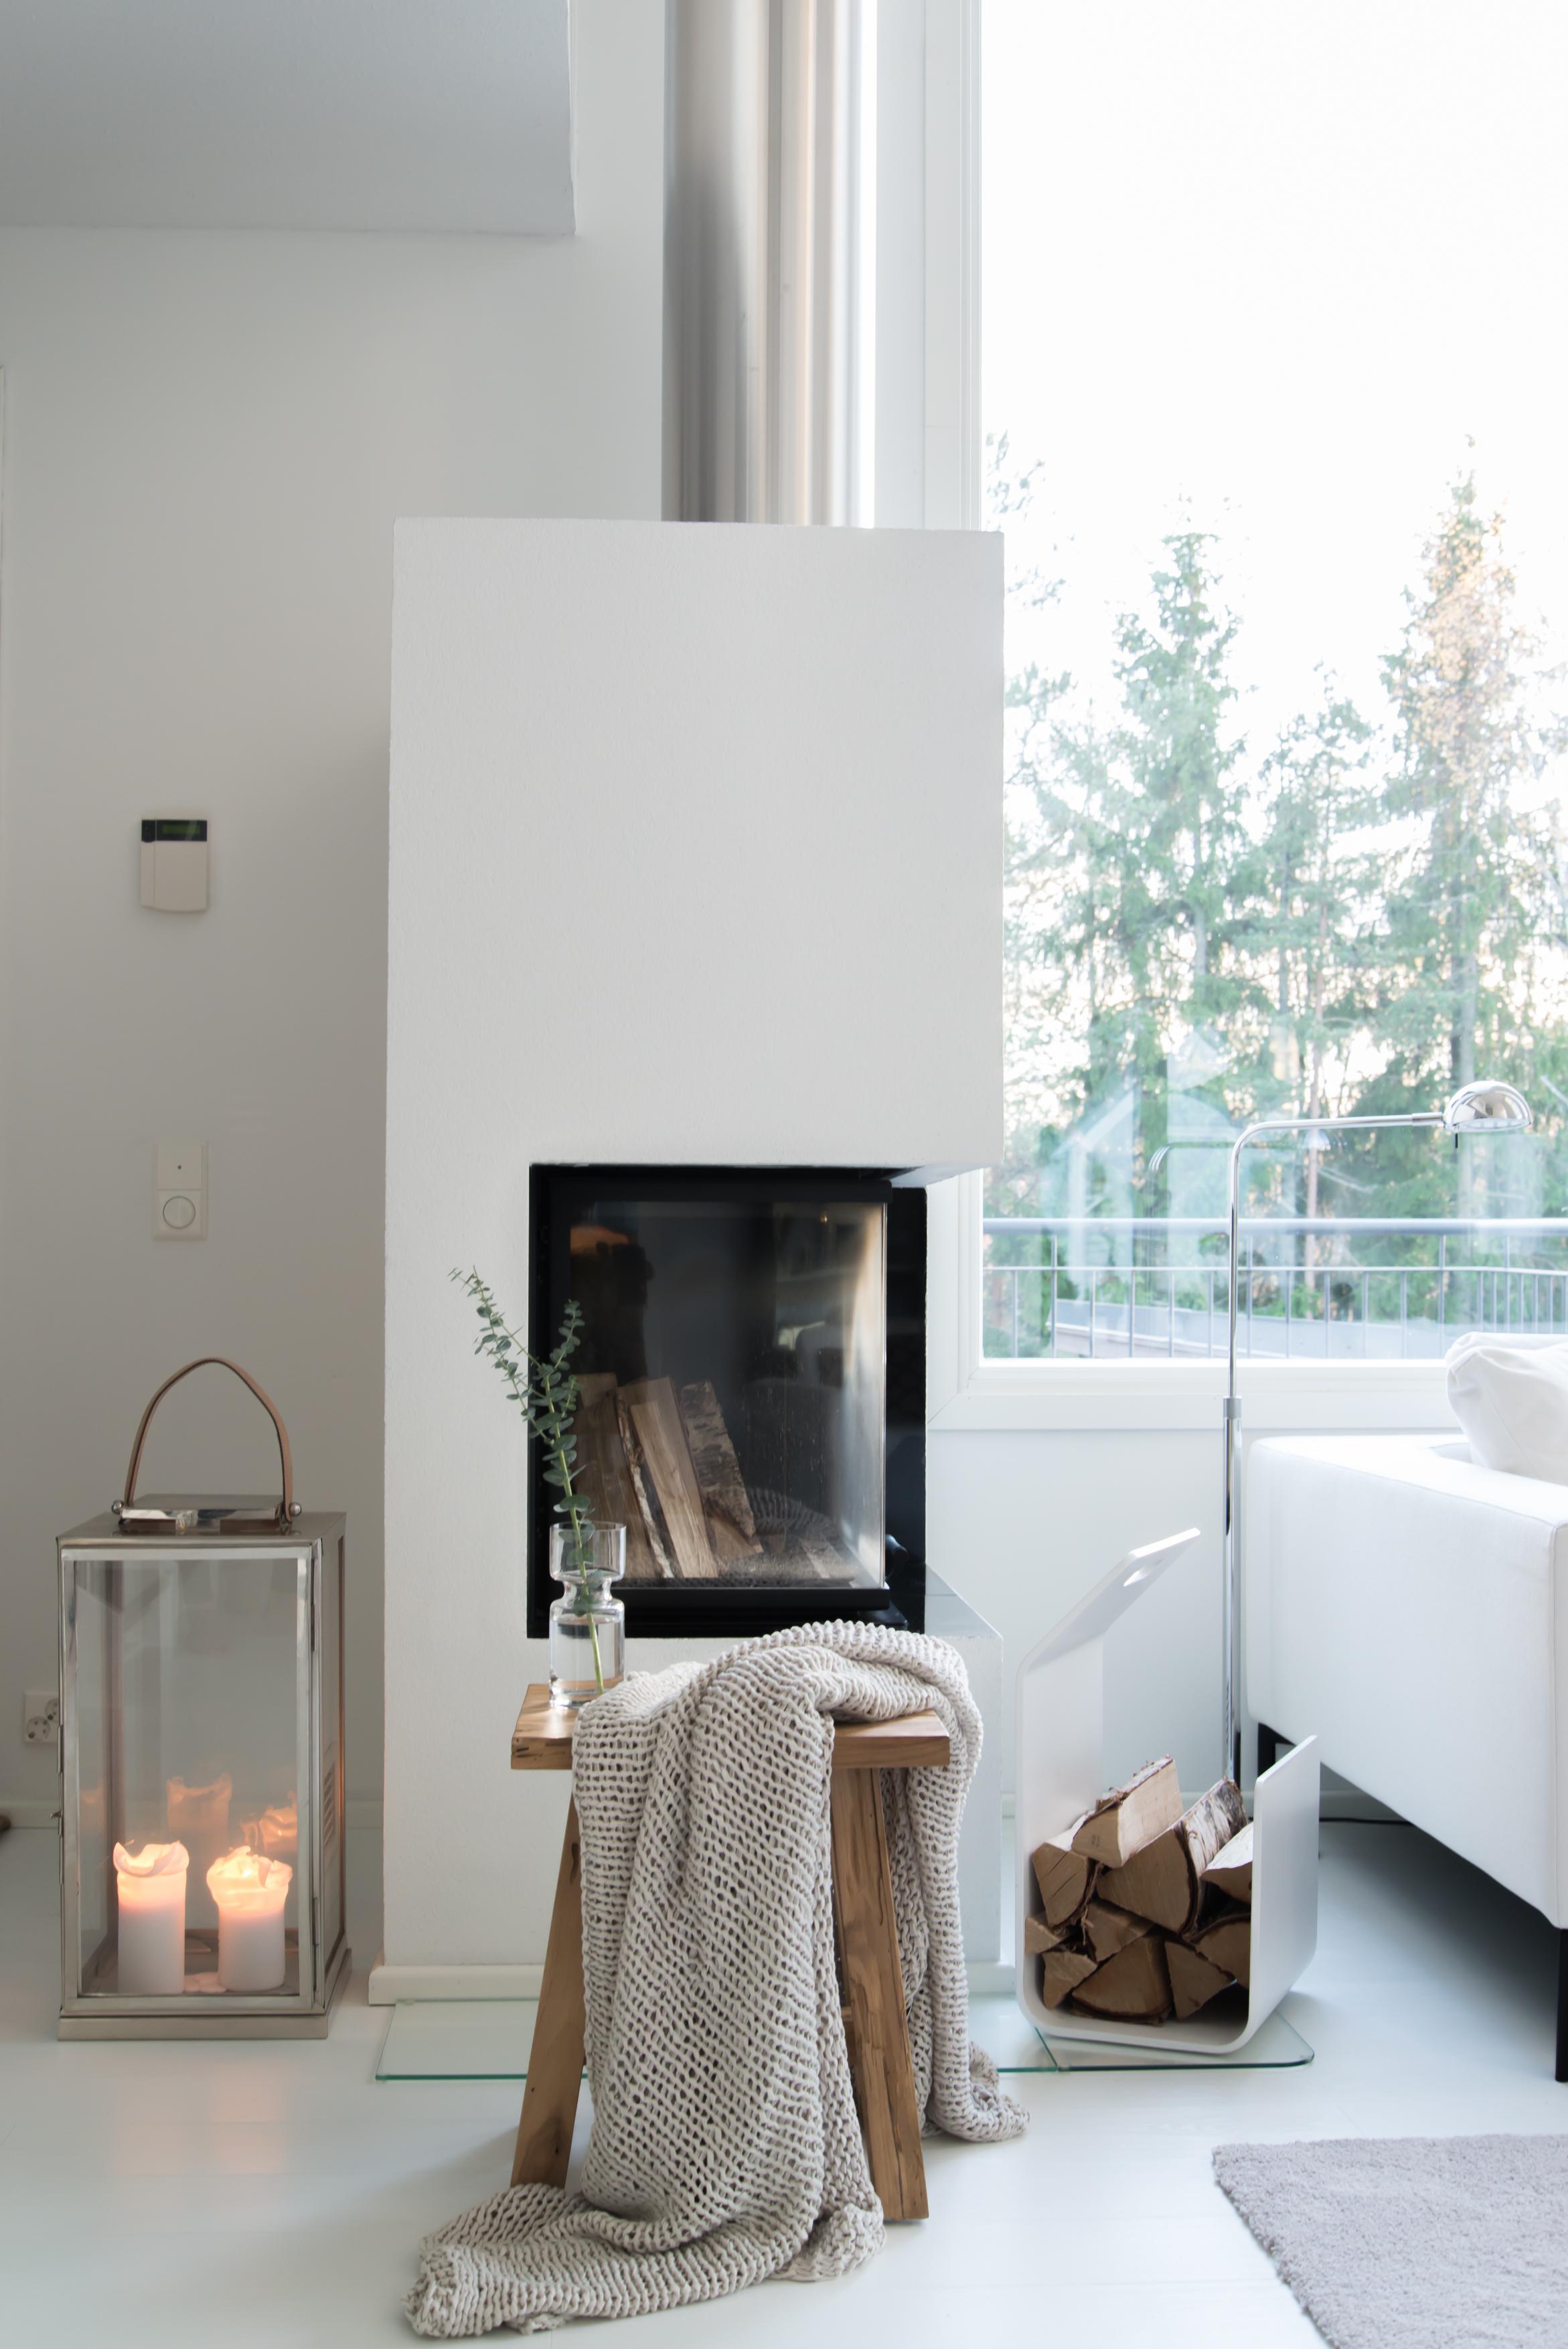 Fireplace 21.10.17_1.jpg